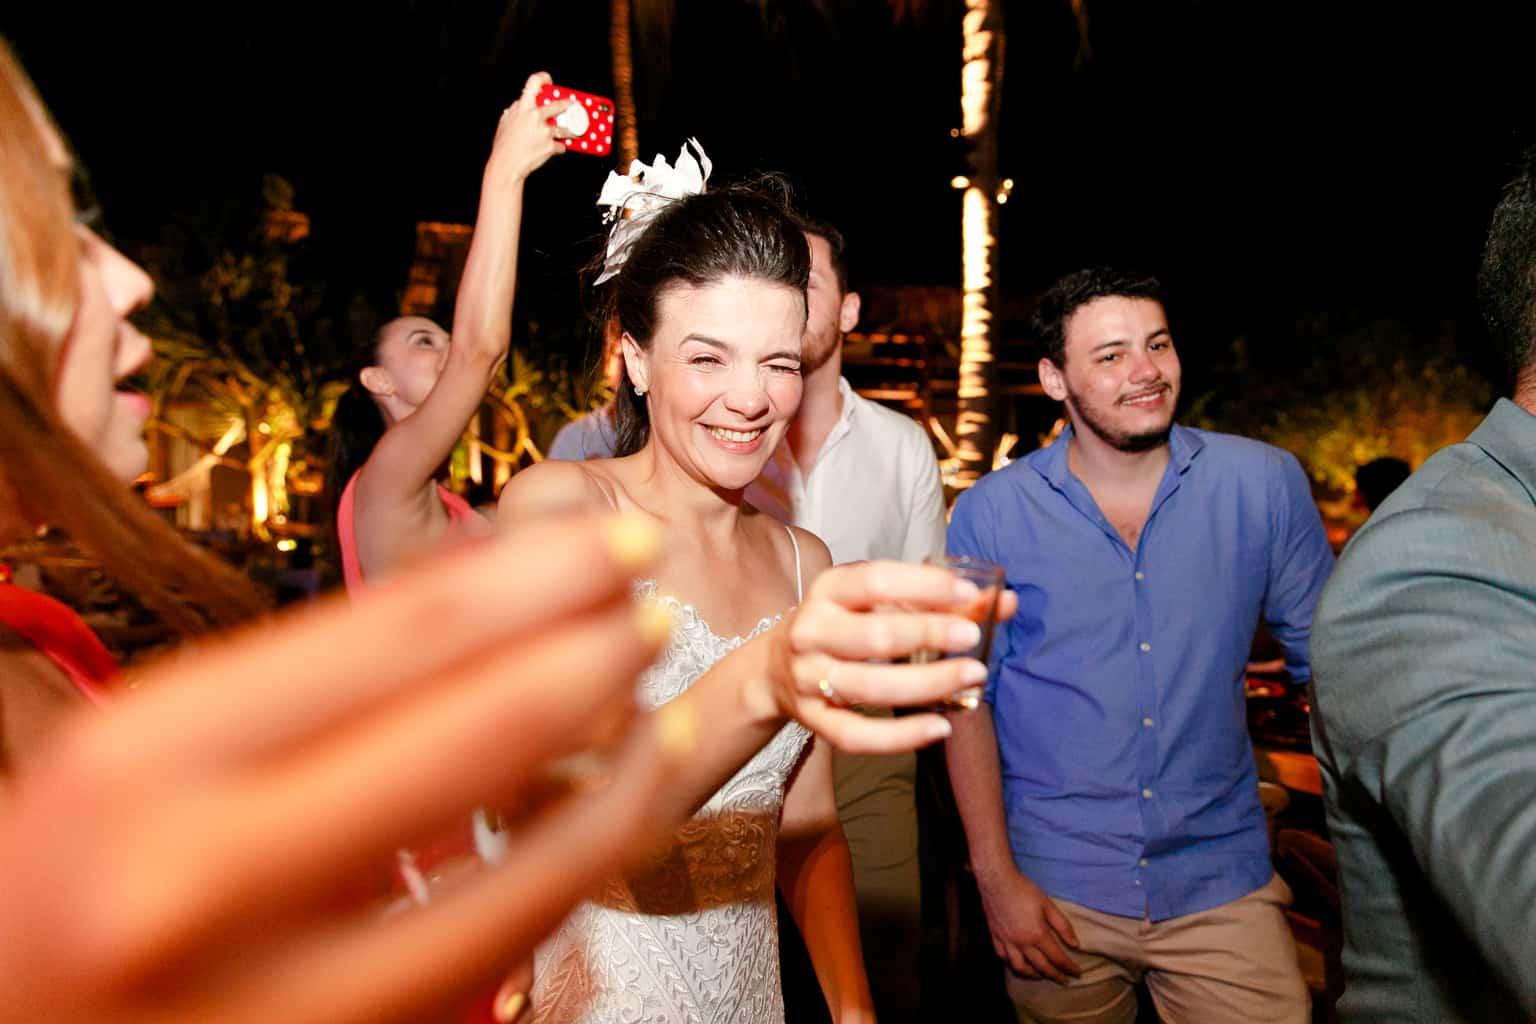 Casamento-Emanuelle-e-Alysson-Fotografia-Tadeu-Nanó-e-Luca-Antunes159